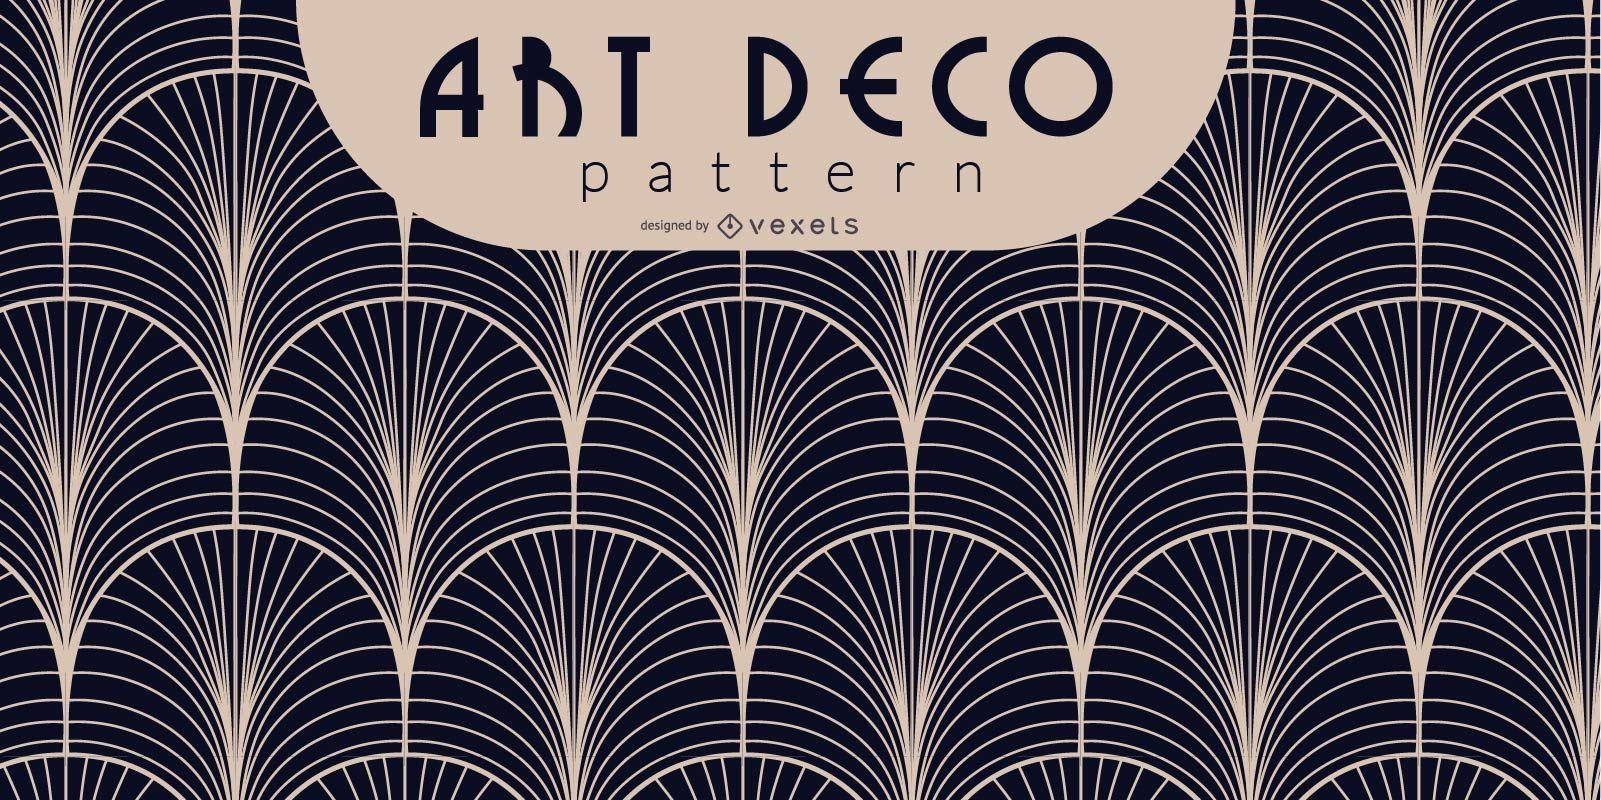 Black and White Art Deco Pattern